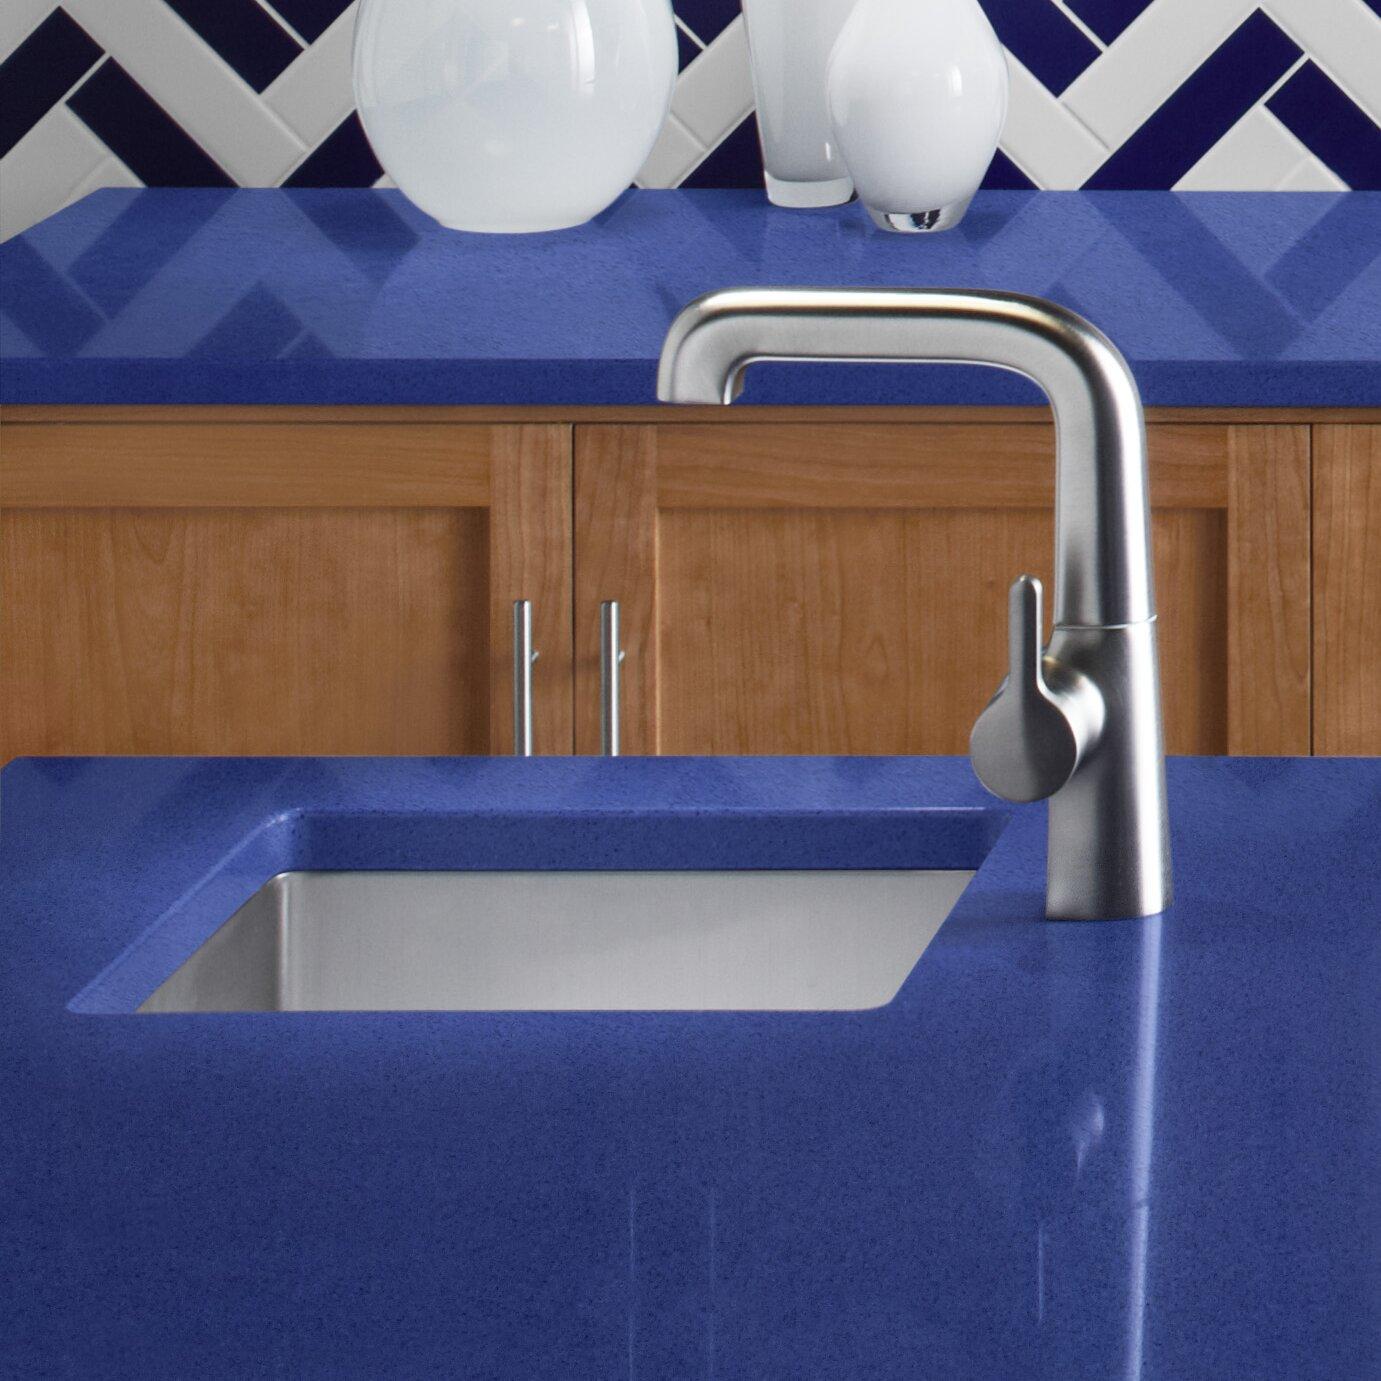 Kohler Strive 15 Quot X 15 Quot Under Mount Bar Sink With Basin